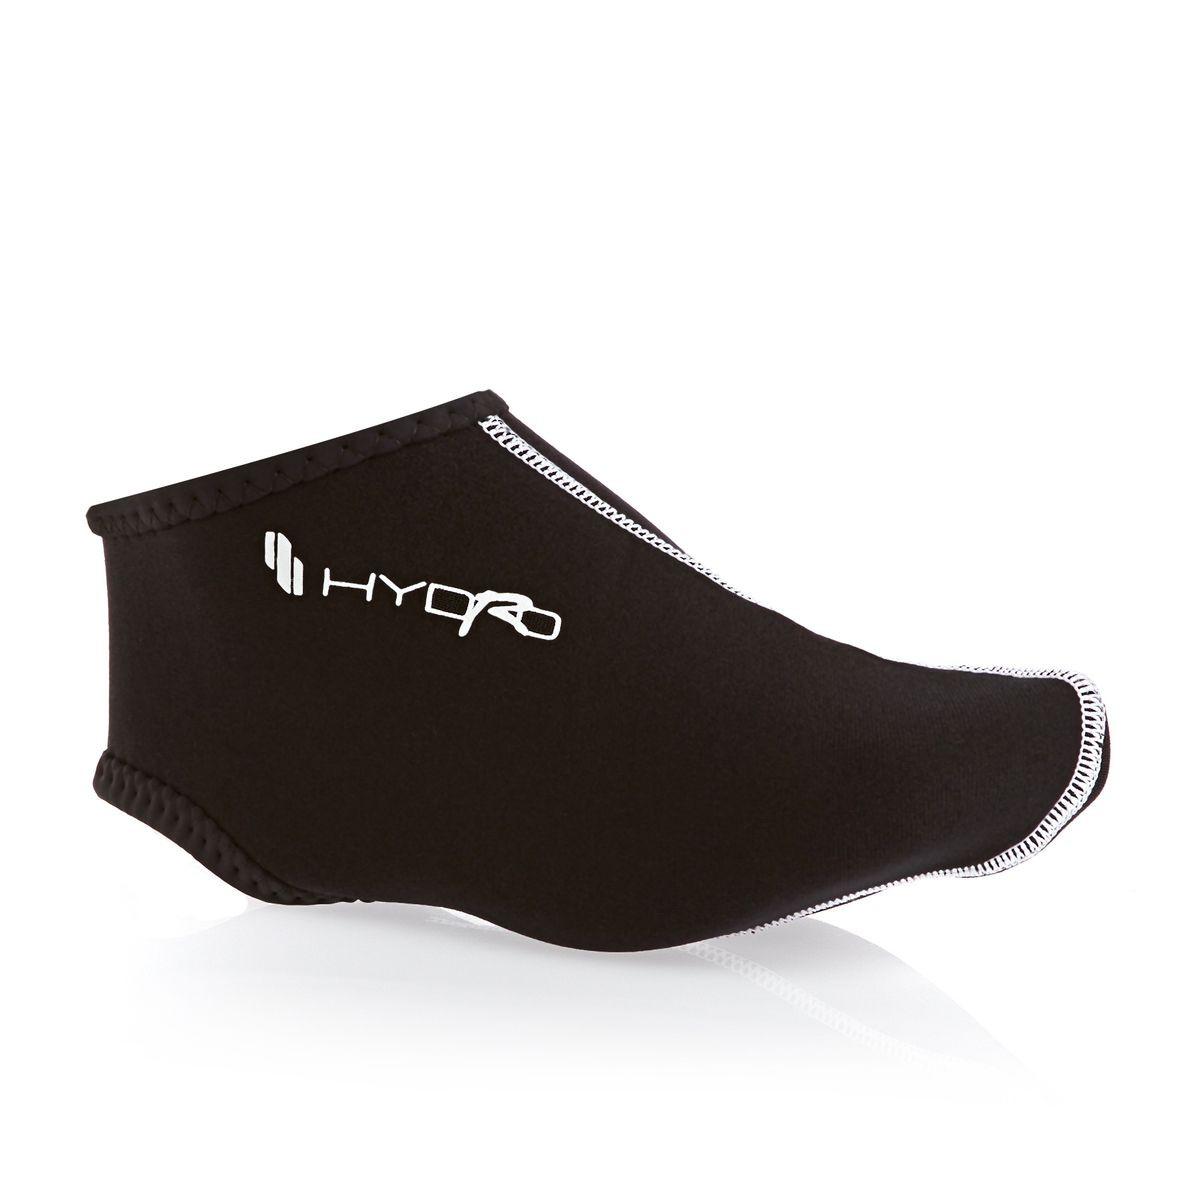 Hydro Neo Summer Wetsuit Socks - 2mm